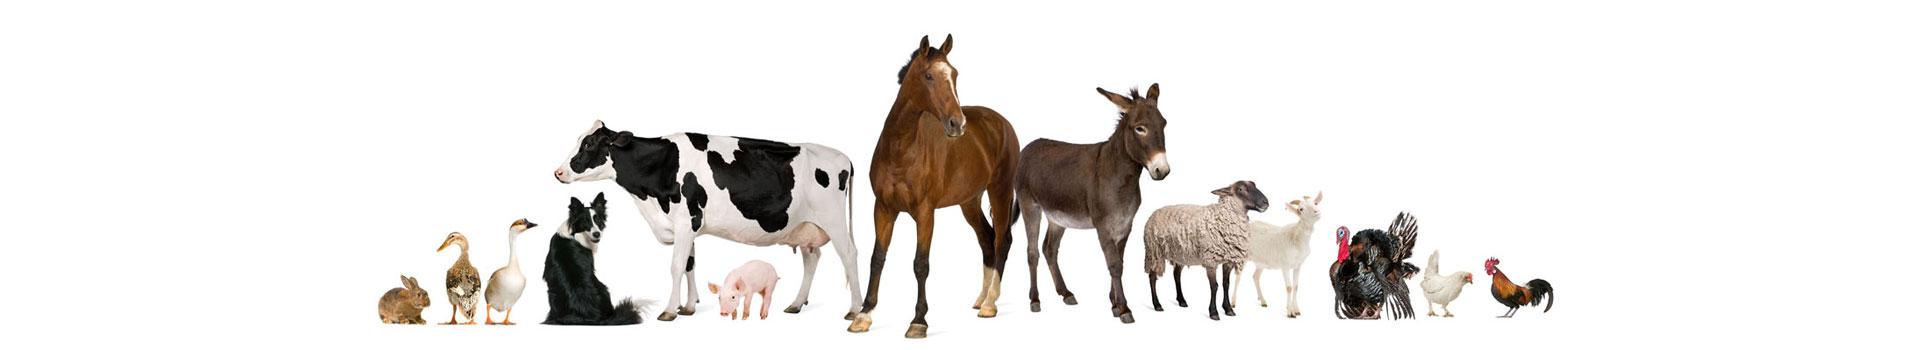 Wanganui Veterinary Services